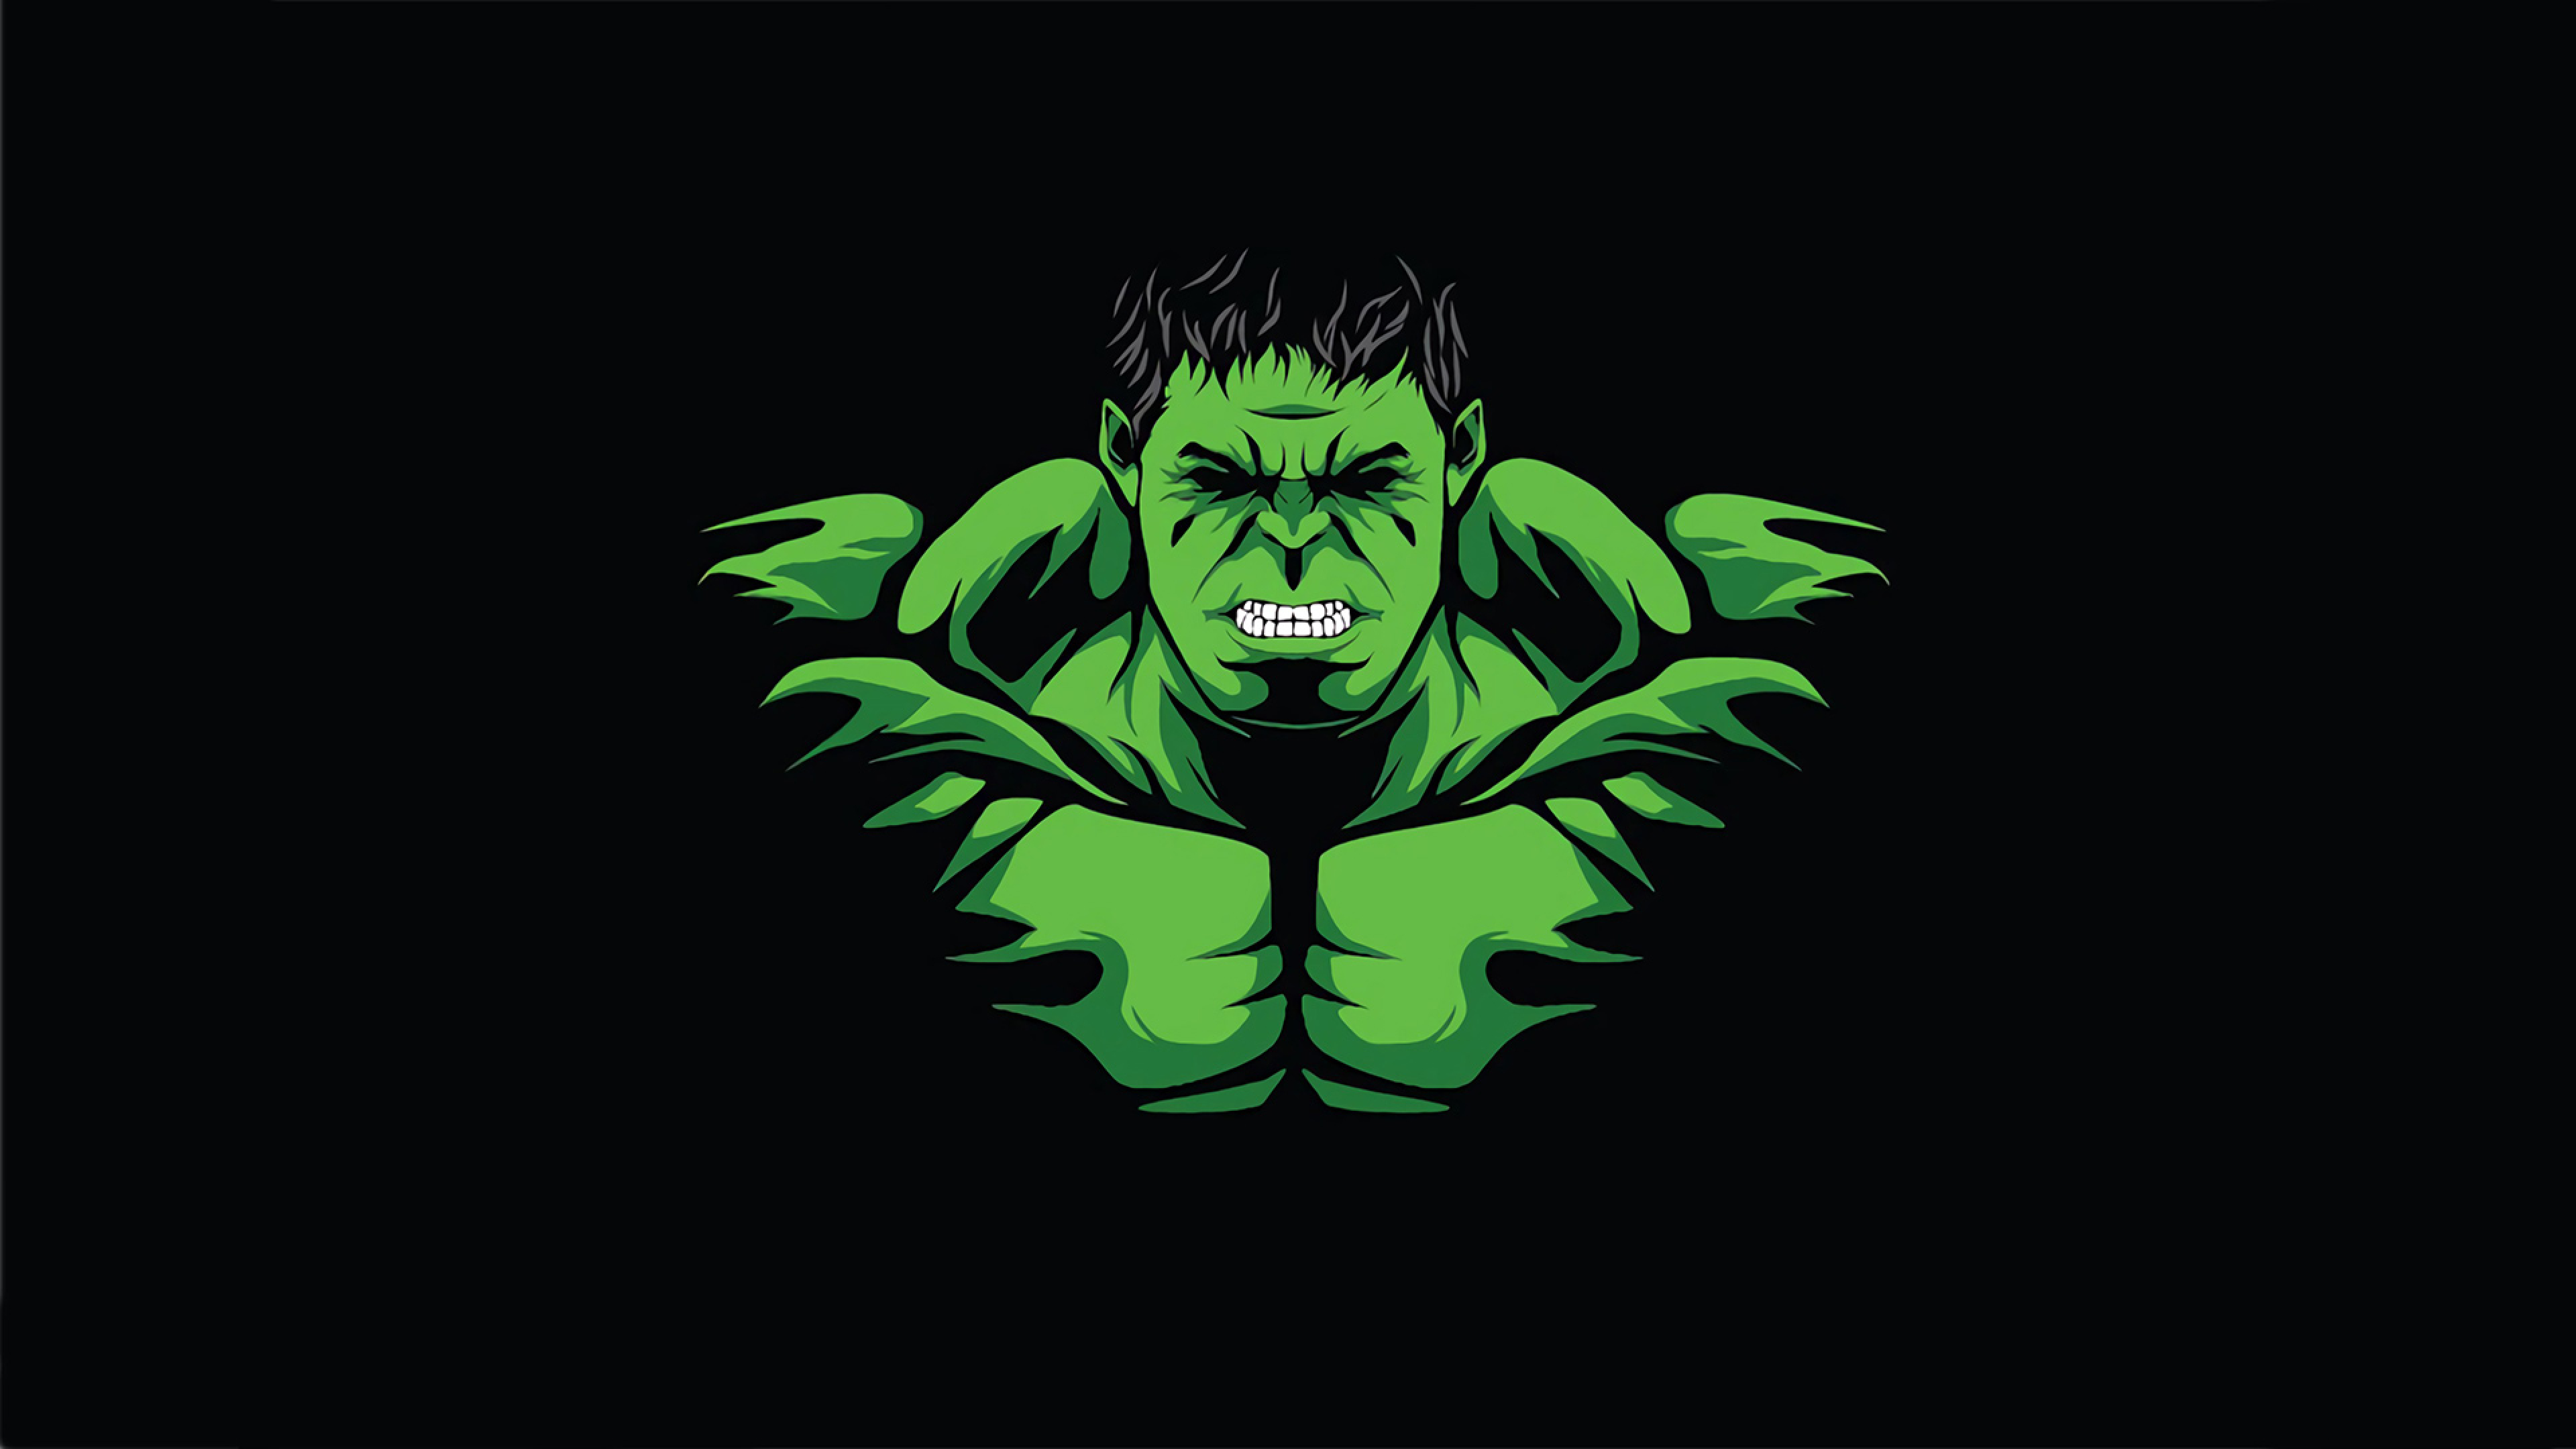 3840x2160 Hulk Minimal 4k Wallpaper Hd Superheroes 4k Wallpapers